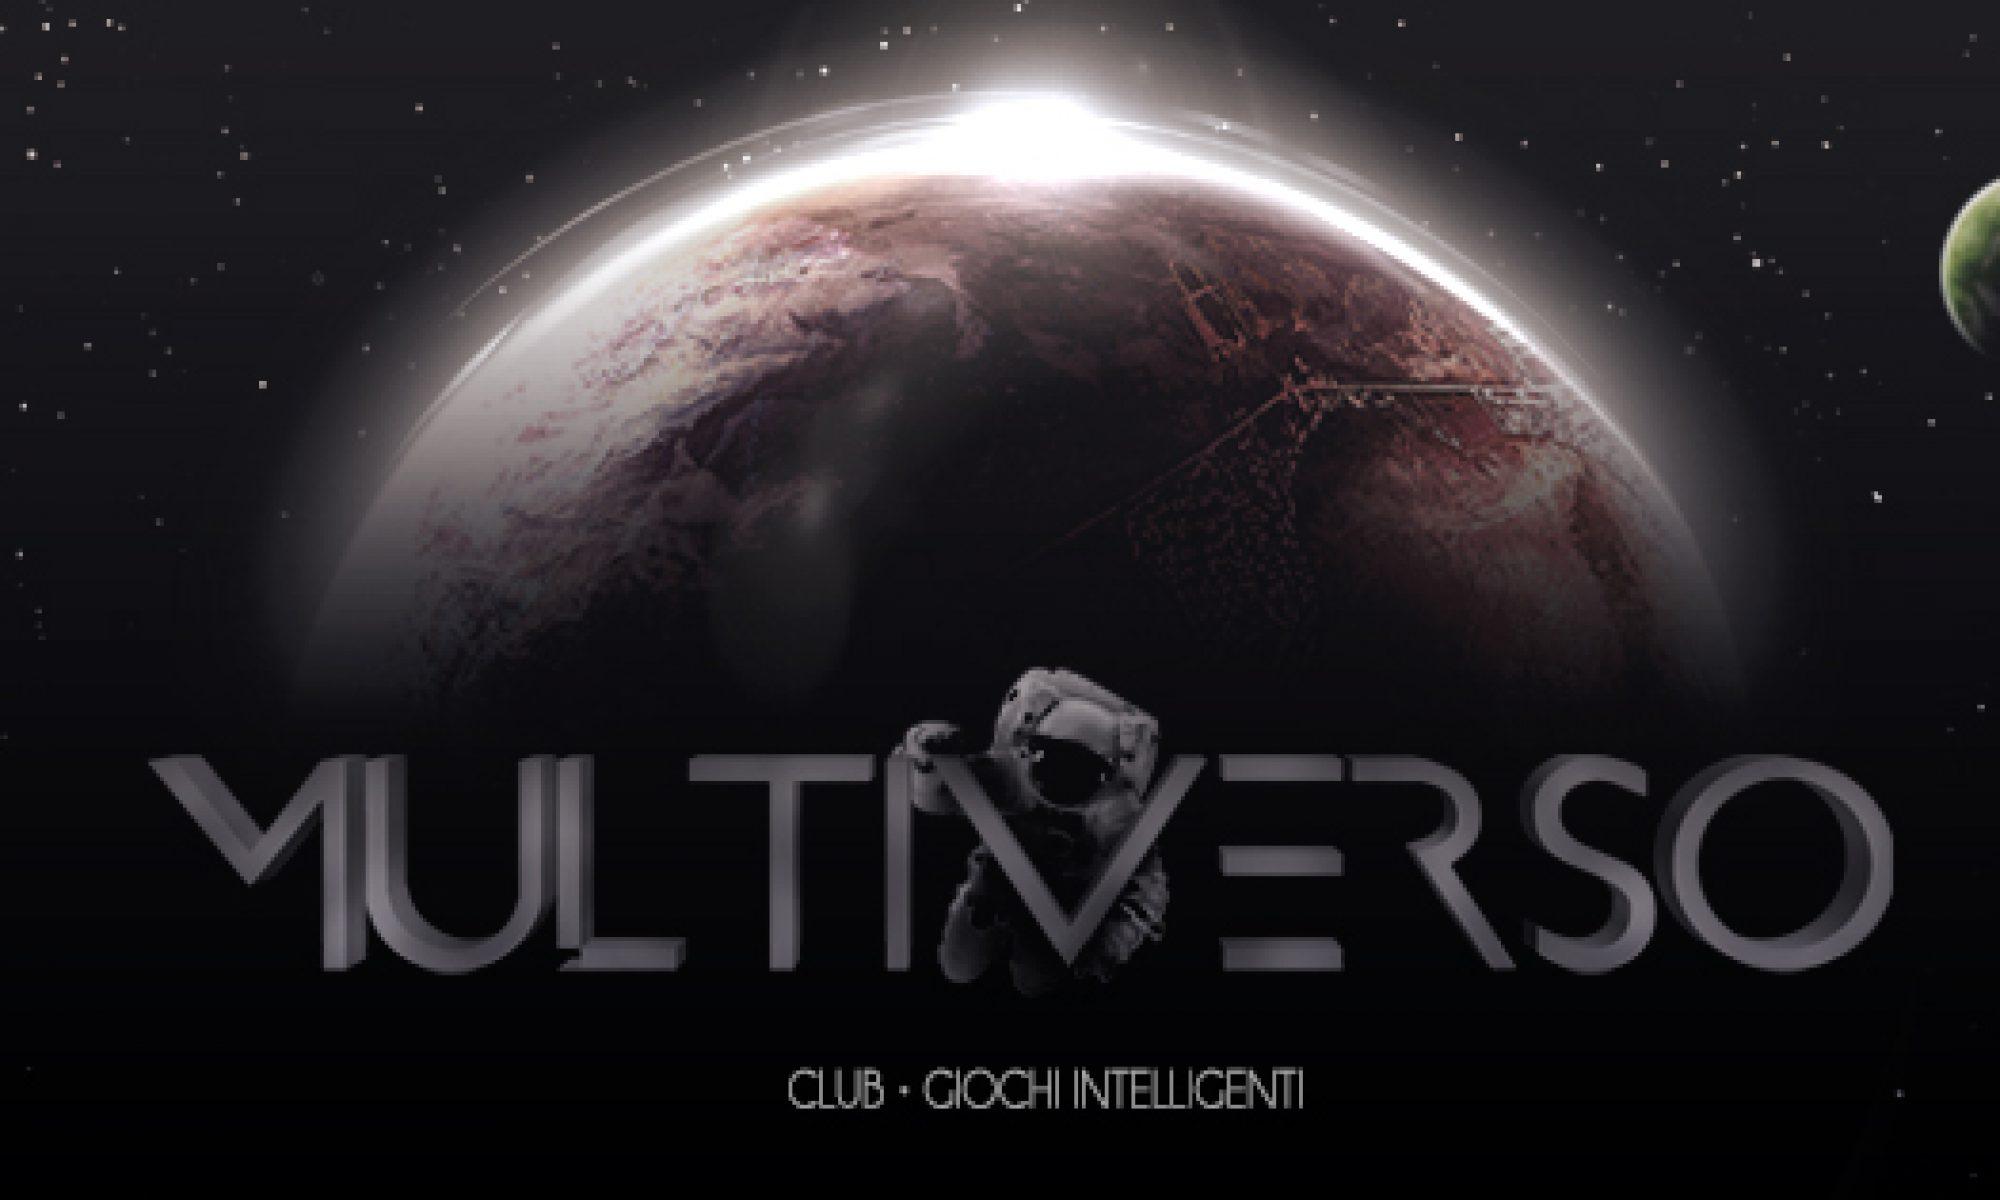 Club Multiverso